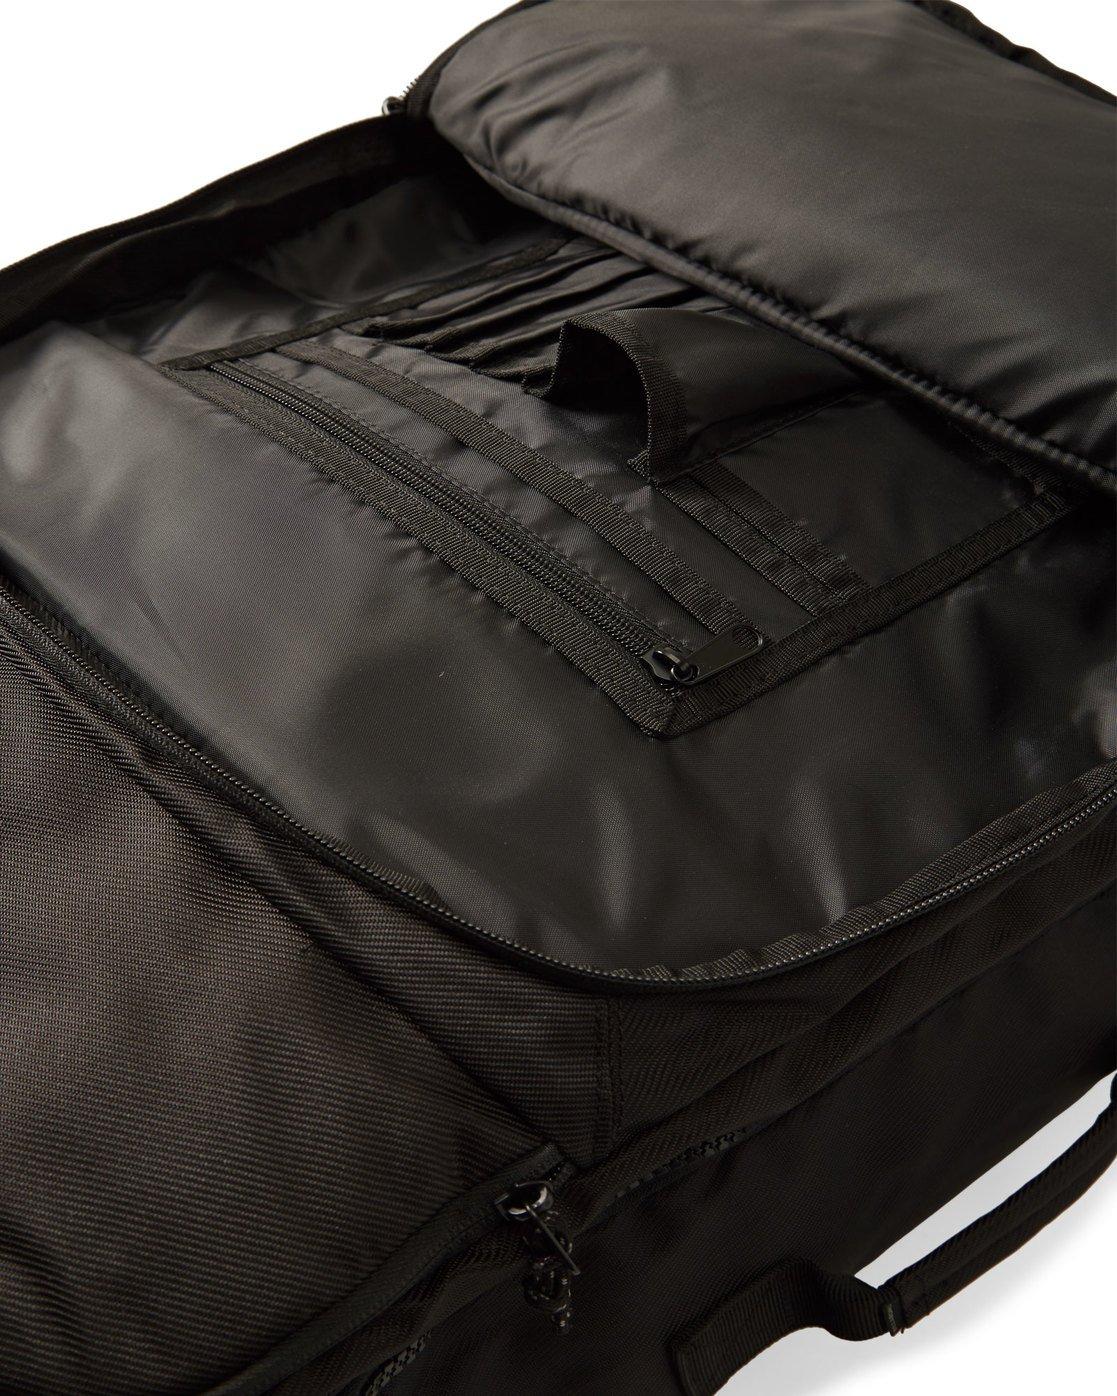 fafaa41ffad4 Booster Carry On Travel Bag